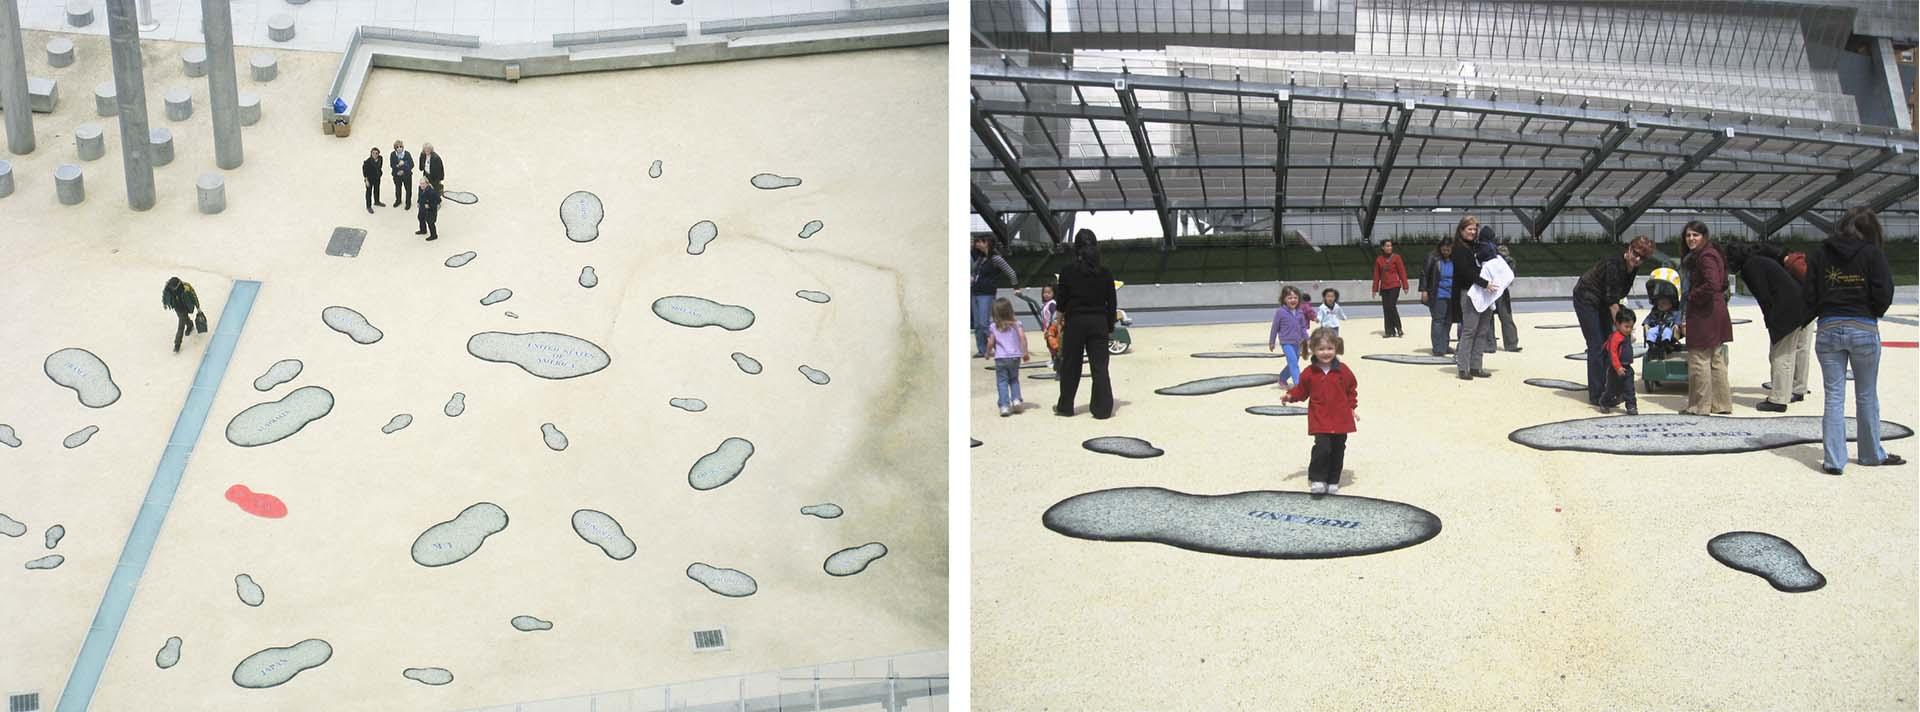 installation of footprints made of carpet padding